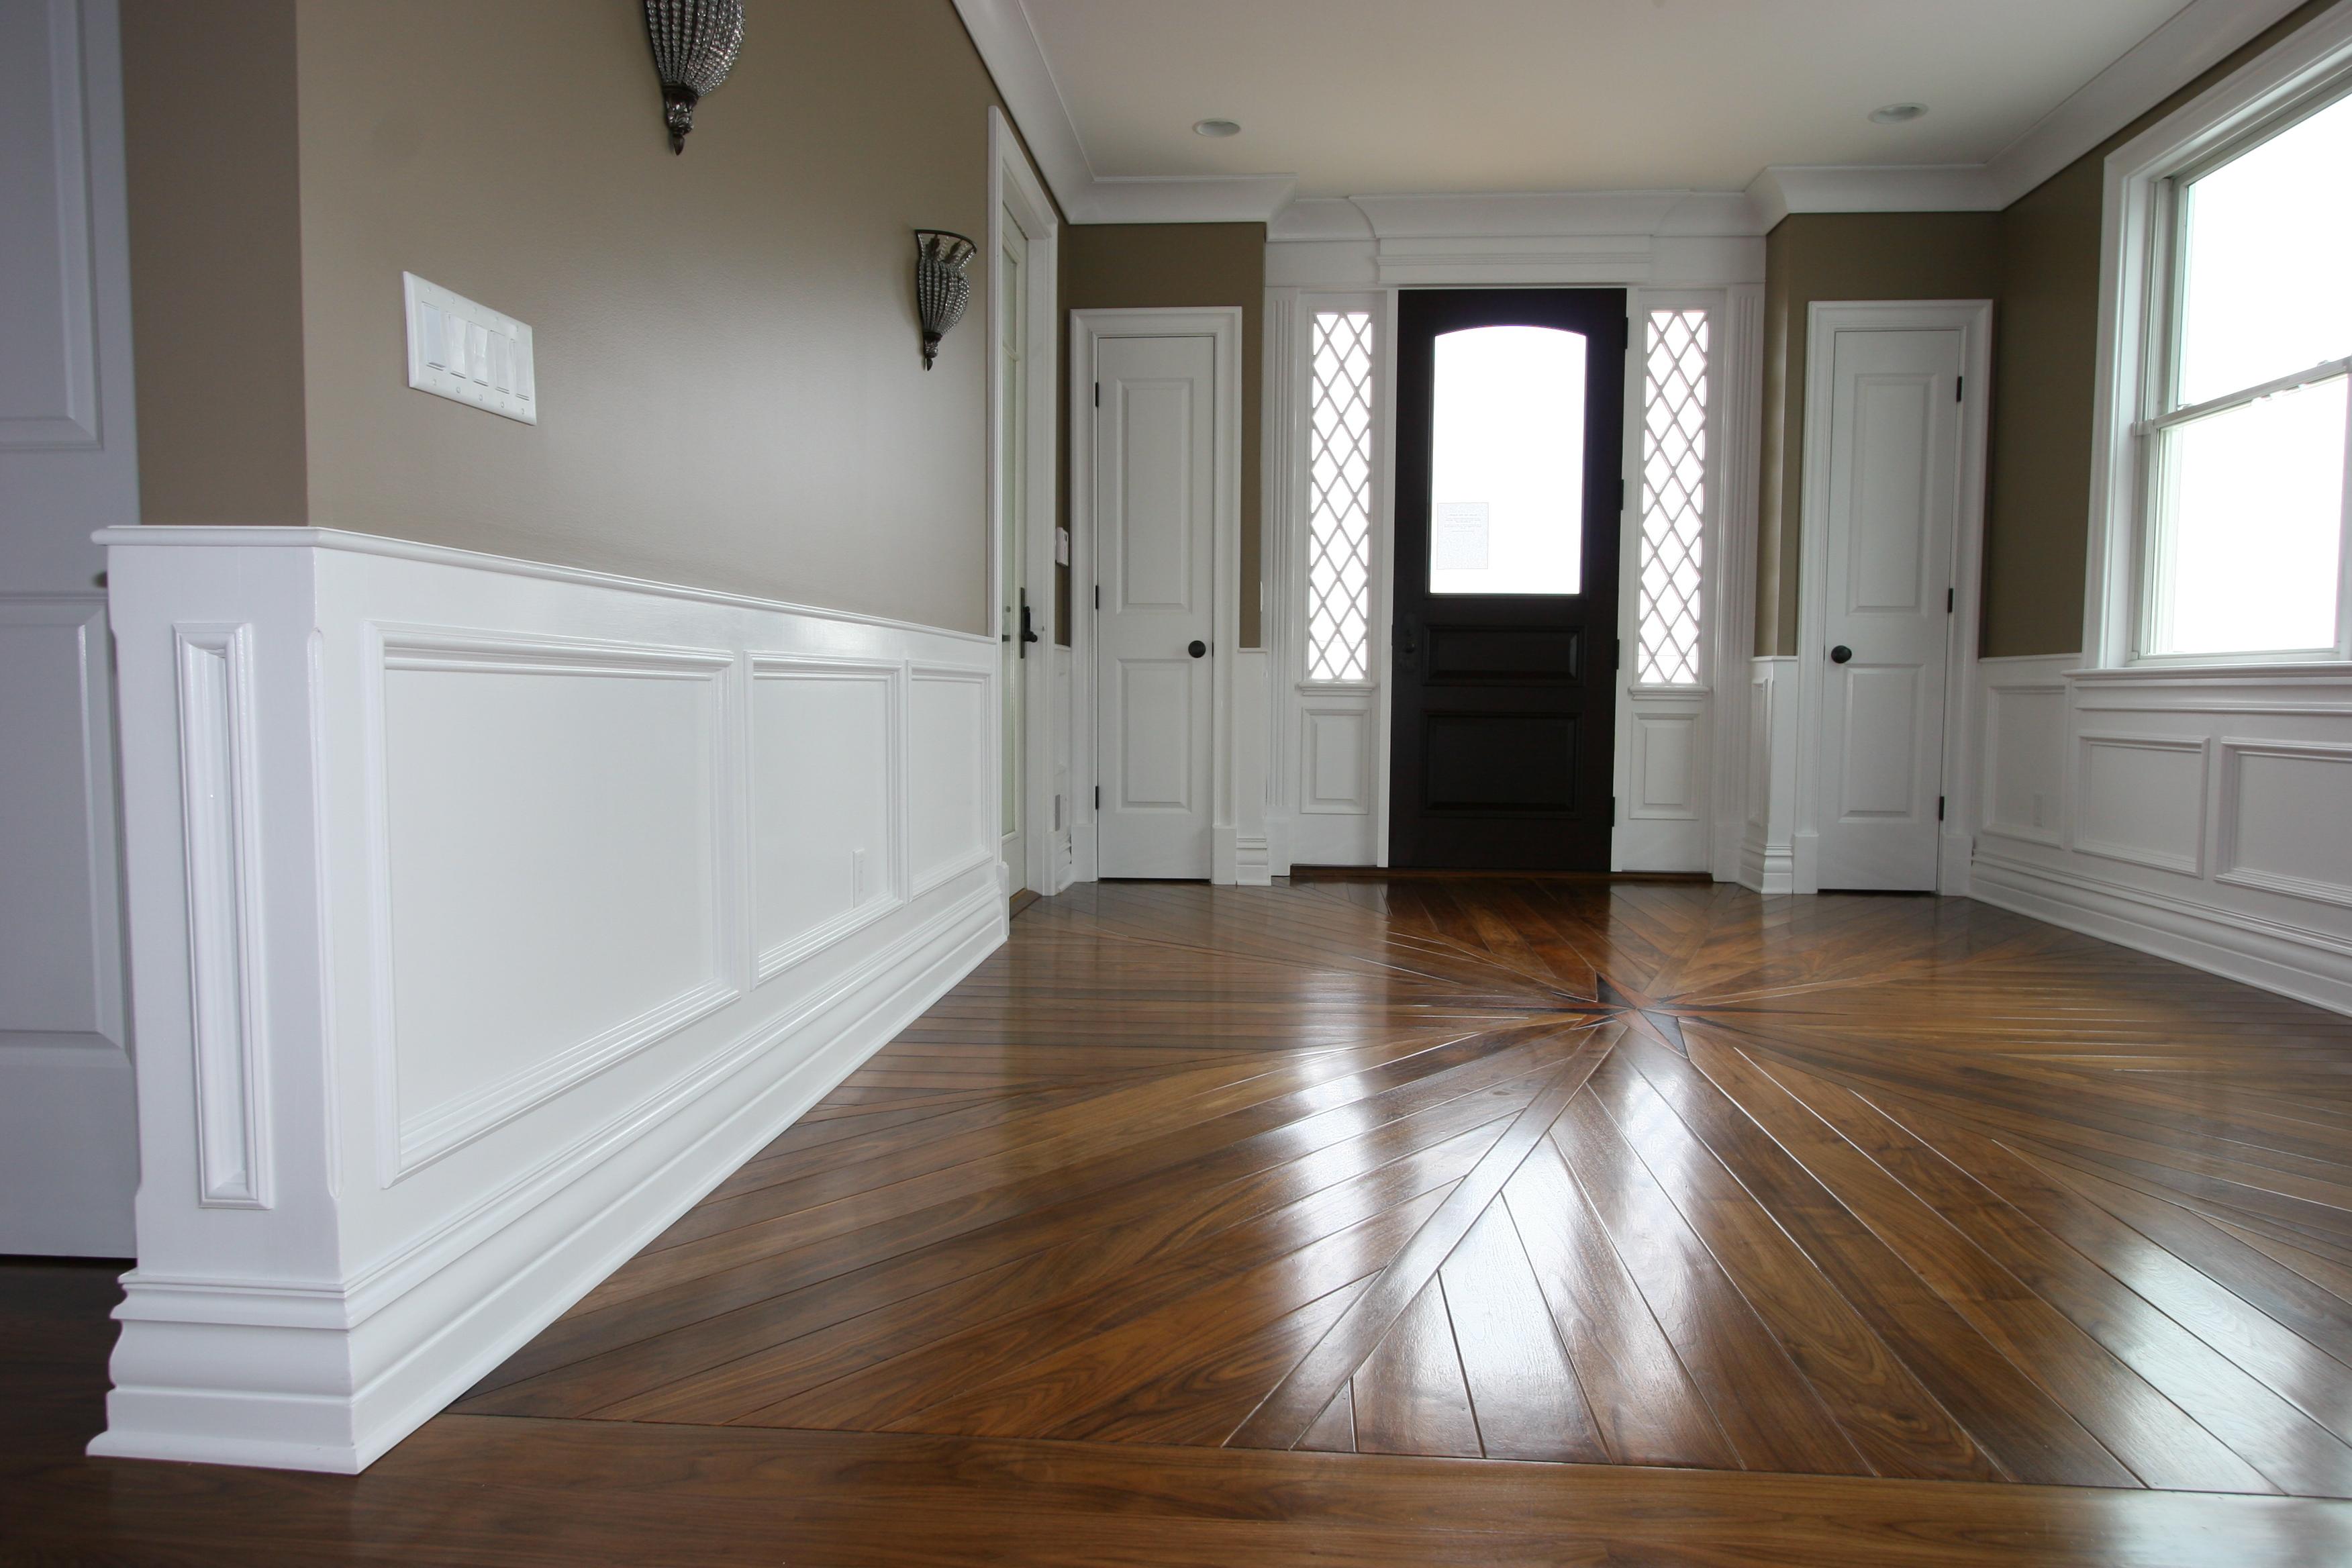 interior wood wall paneling designs photo - 9